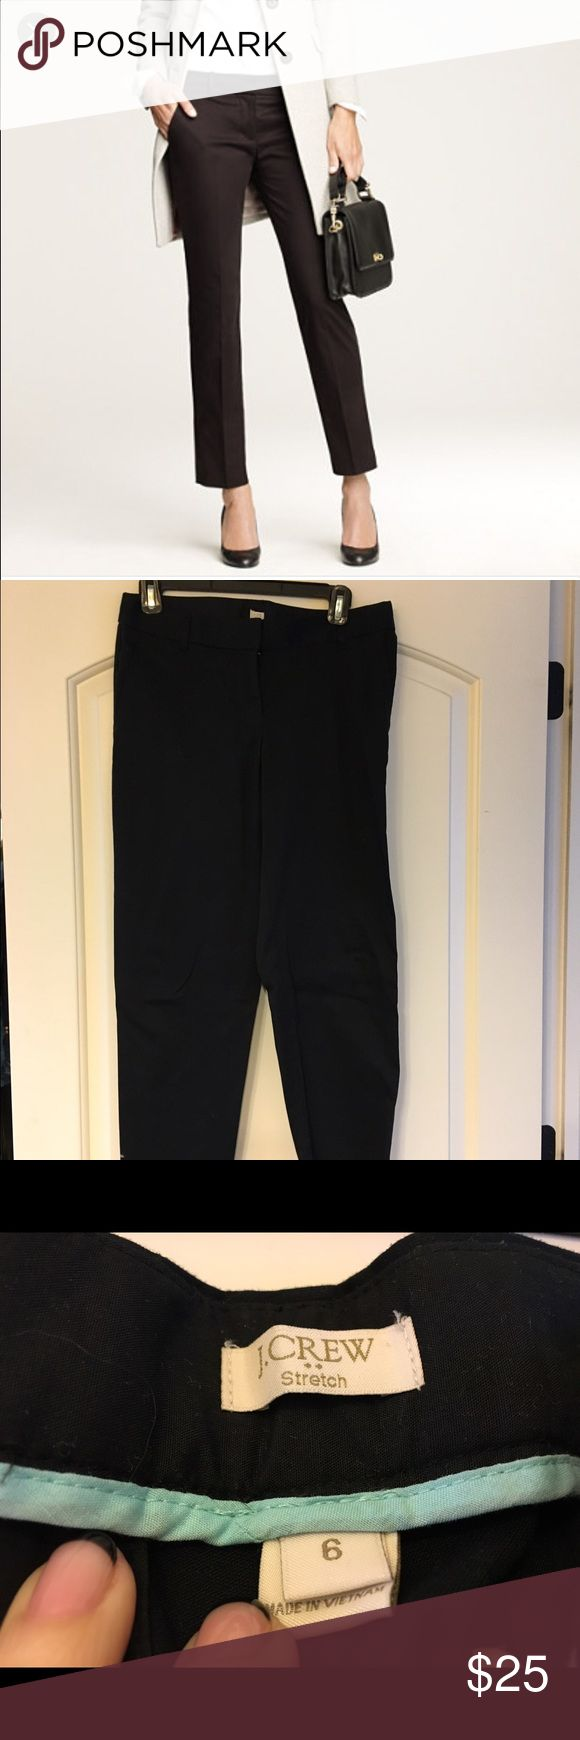 Jcrew cafe Capri Cotton, cropped pants. Black. Like new J. Crew Pants Ankle & Cropped